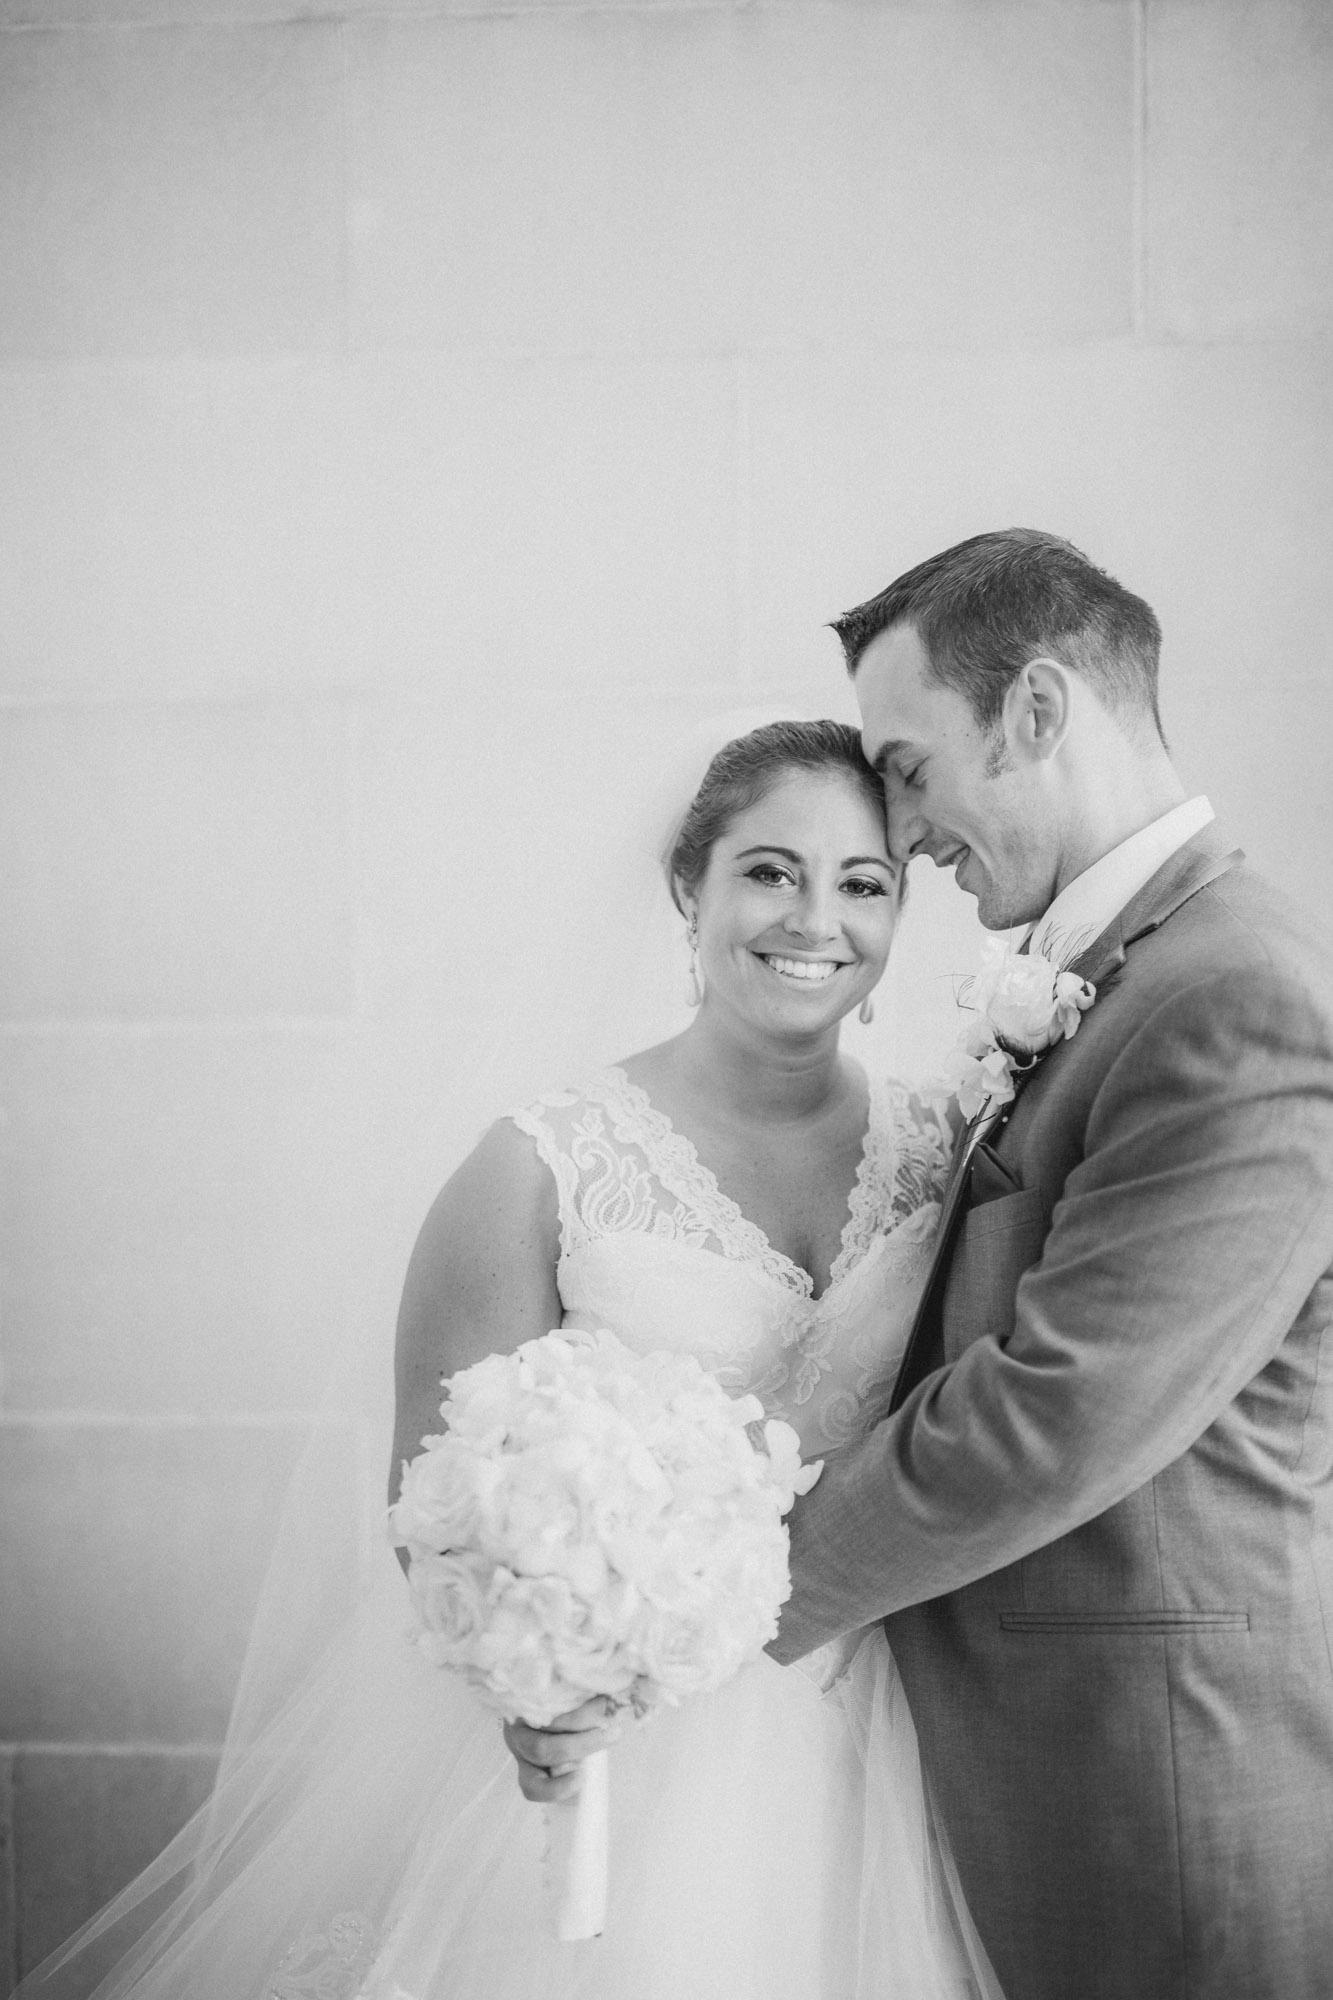 Mike & Danielle's Scranton Wedding Photography 58